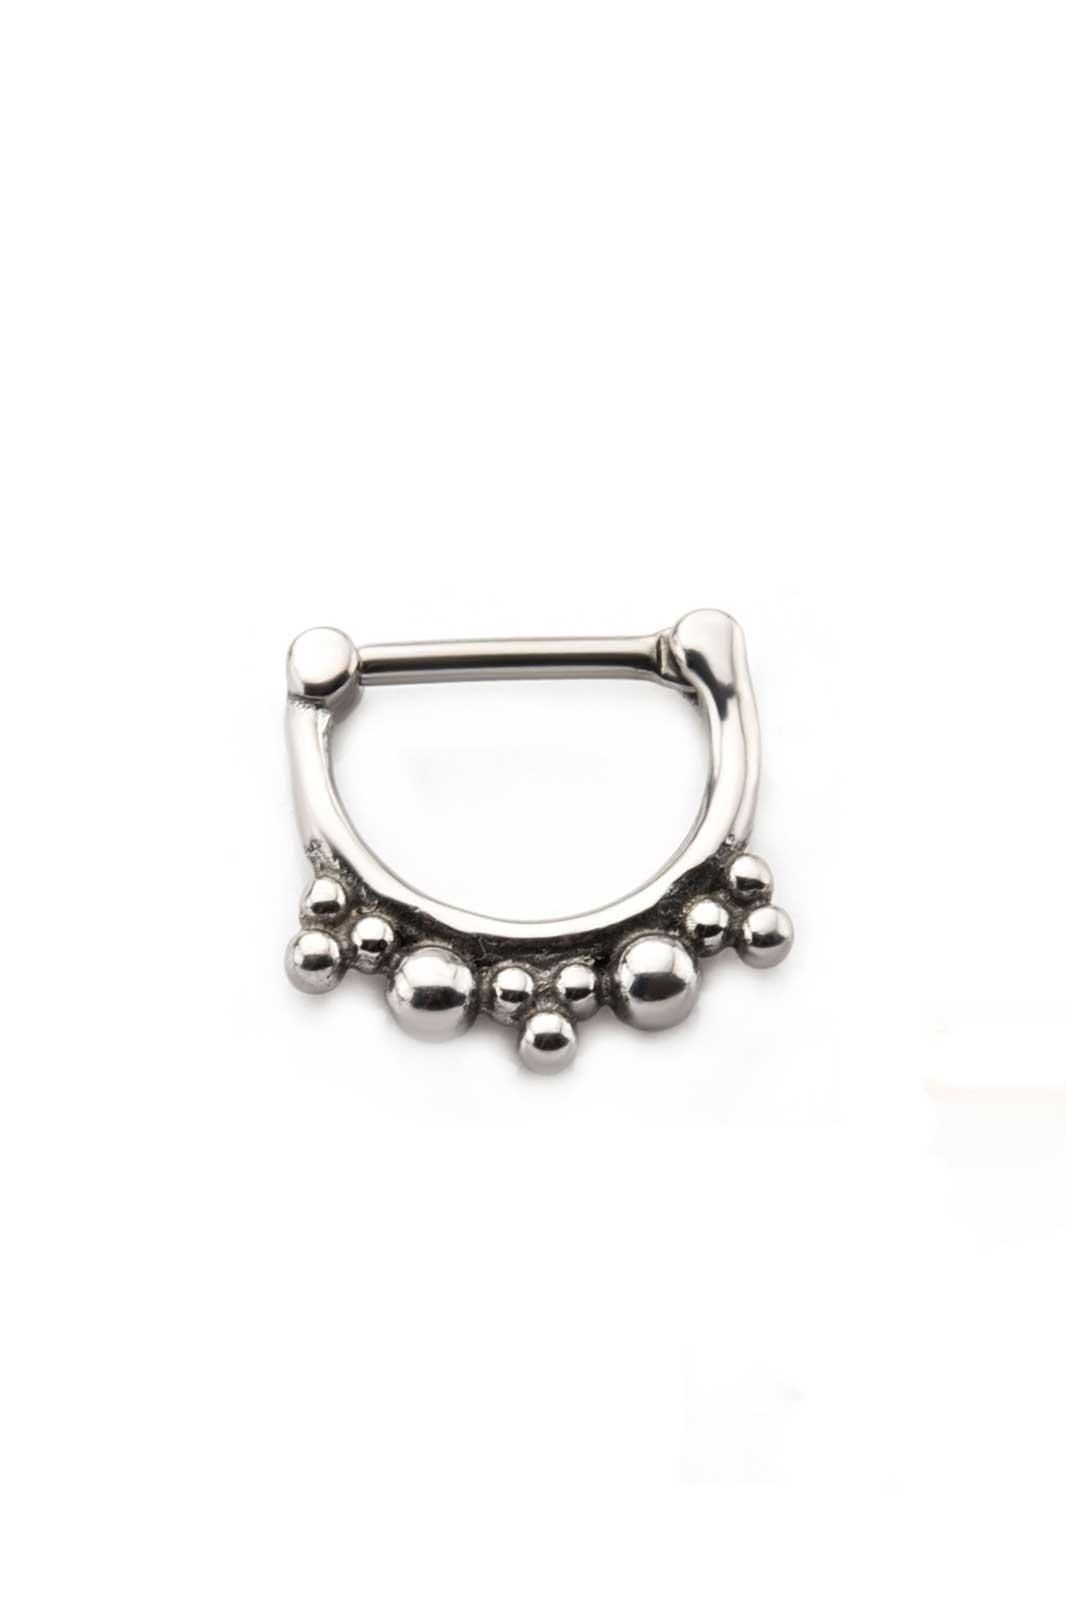 Multi Size Beads Septum Clicker